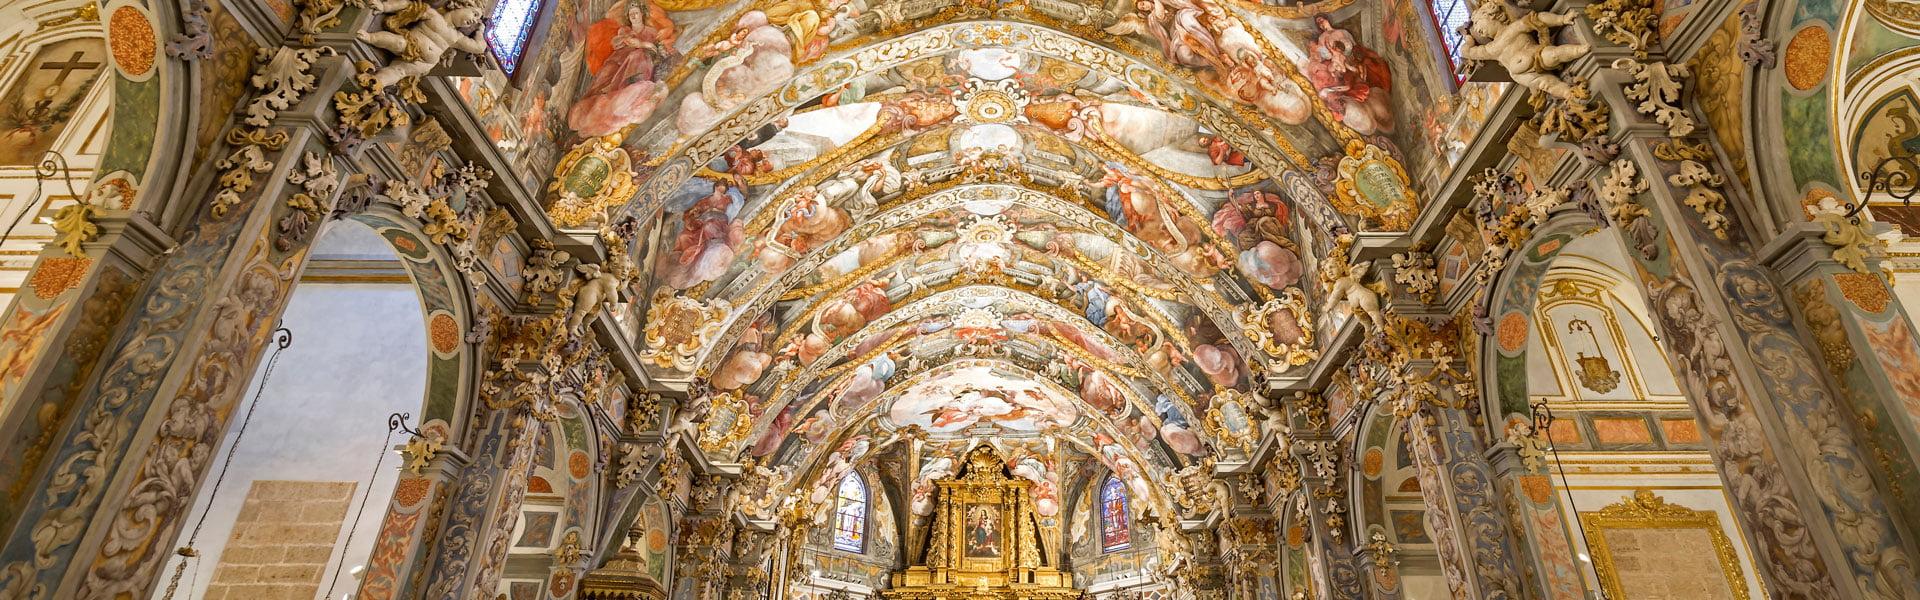 Visitas guiadas Iglesia de San Nicolás